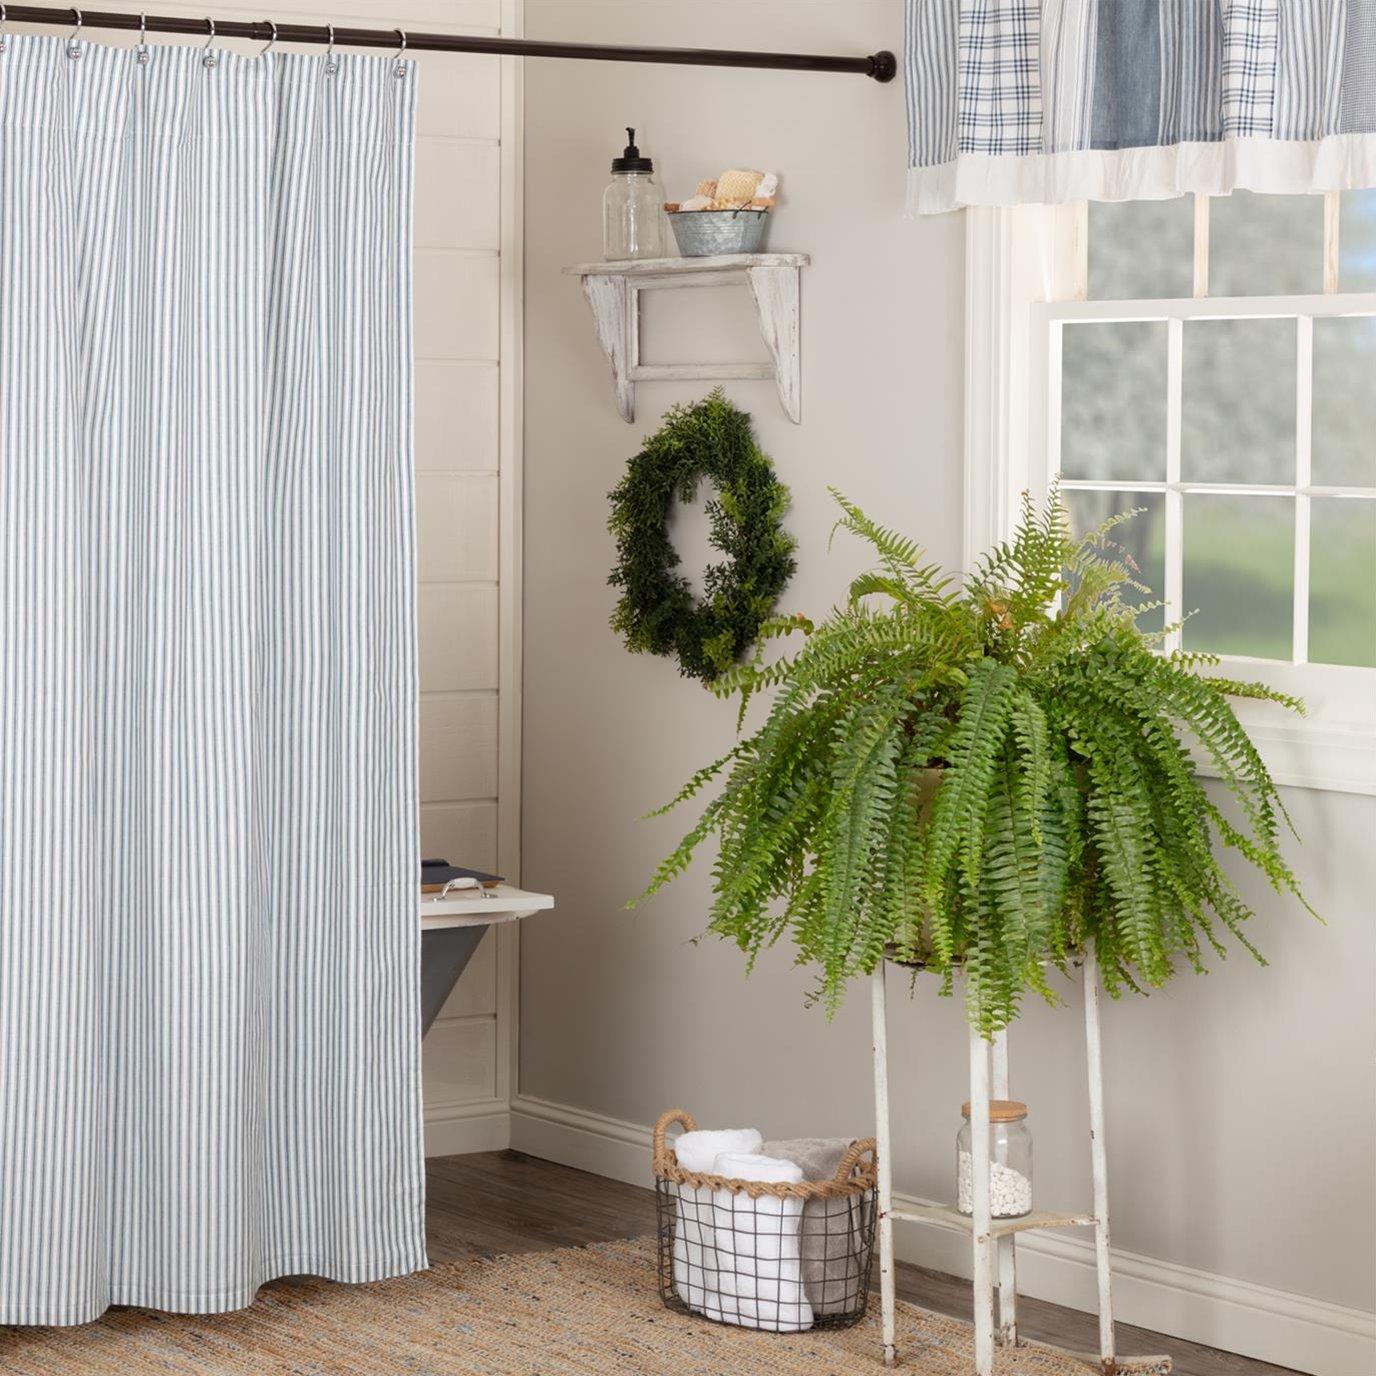 Sawyer Mill Blue Ticking Stripe Shower Curtain 72x72